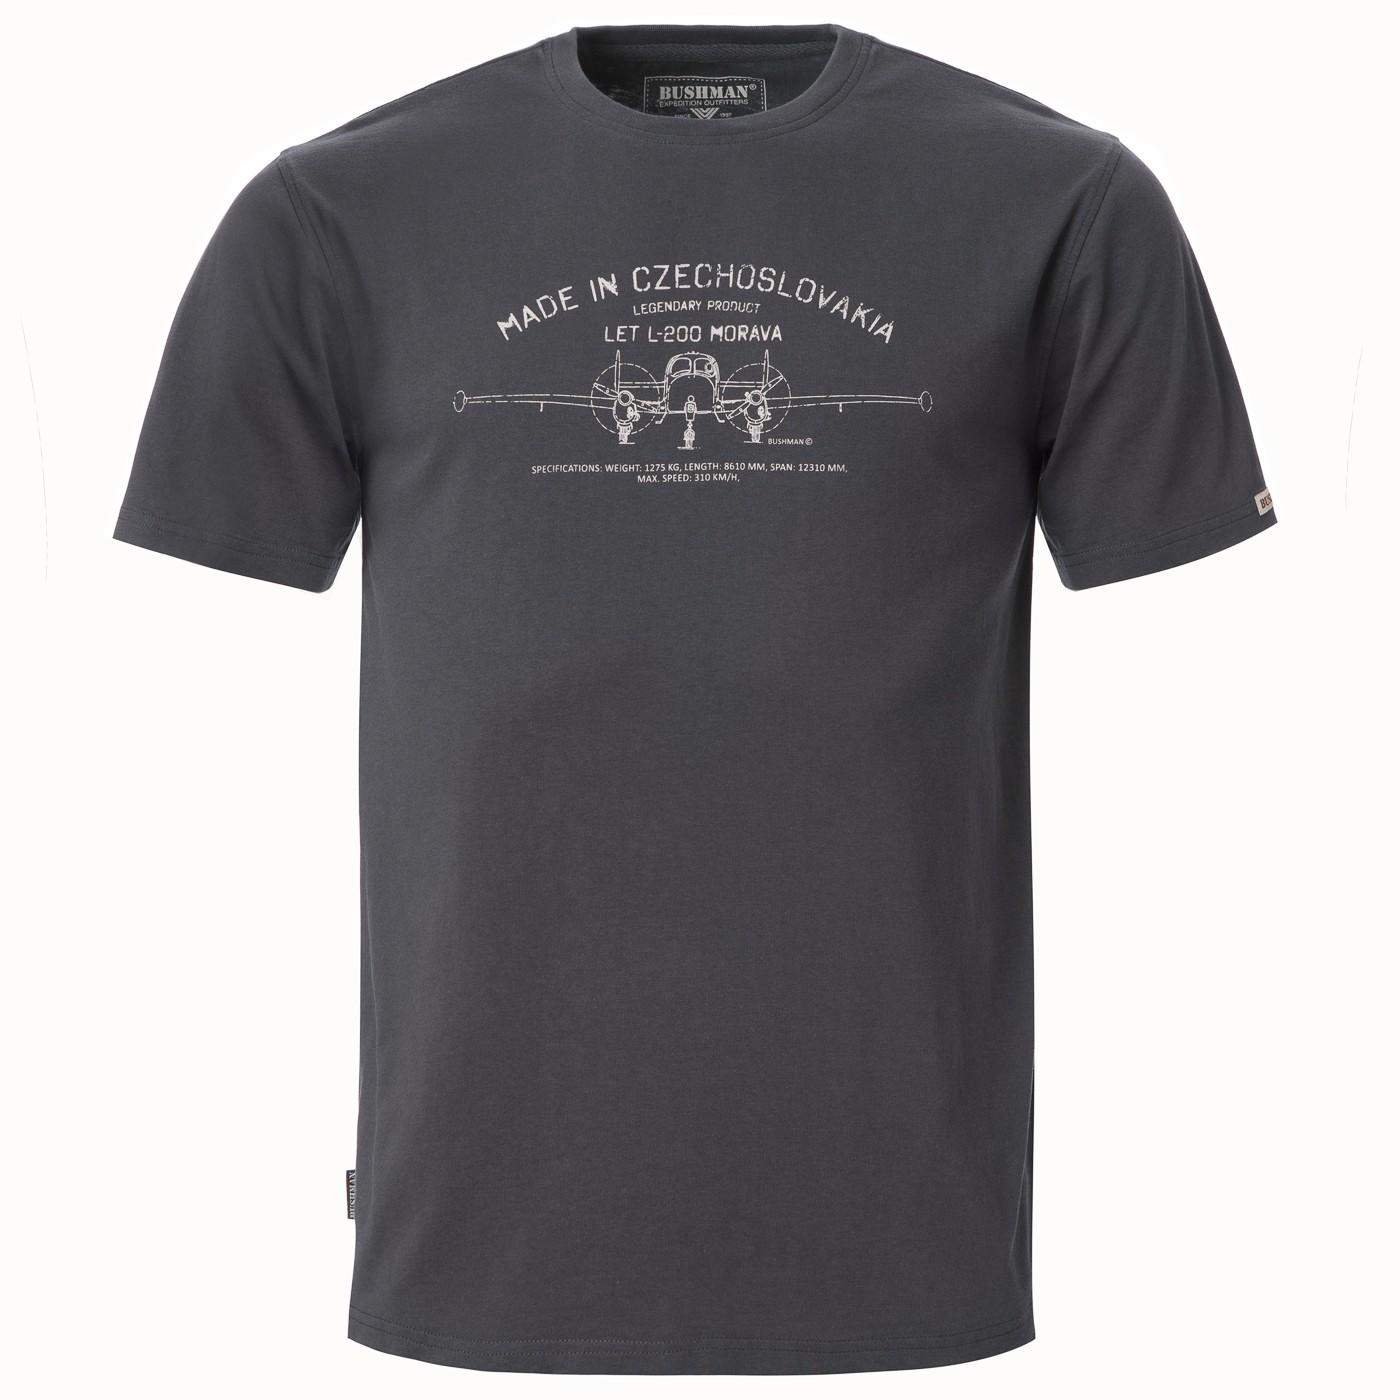 Recenze Bushman: Bavlněné tričko s potiskem MADE IN CZECHOSLOVAKIA